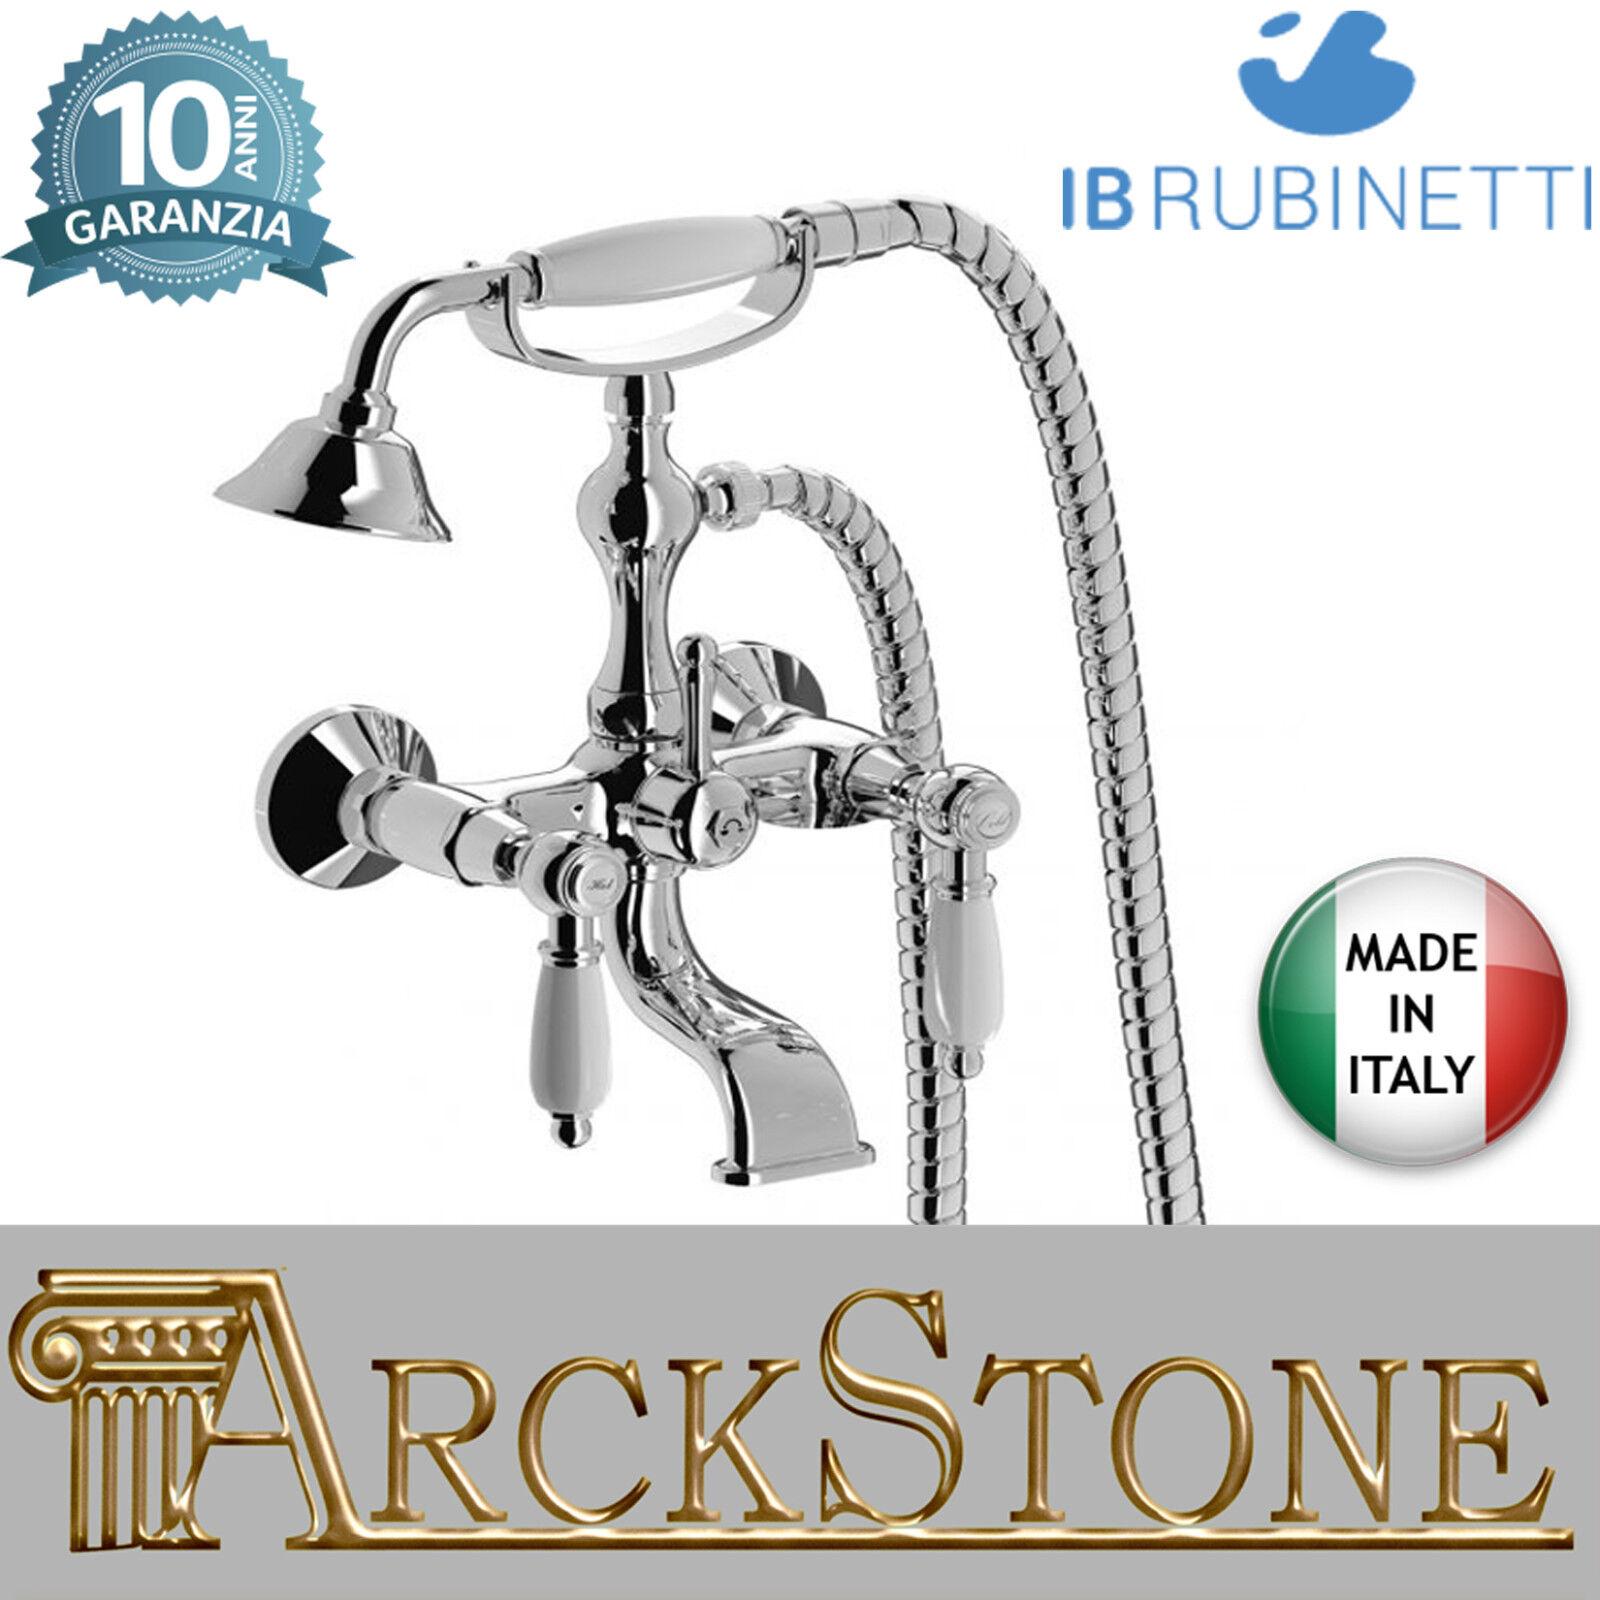 Miscelatore gruppo vasca esterno a parete kit doccia IB rubinetti Hermes Elle